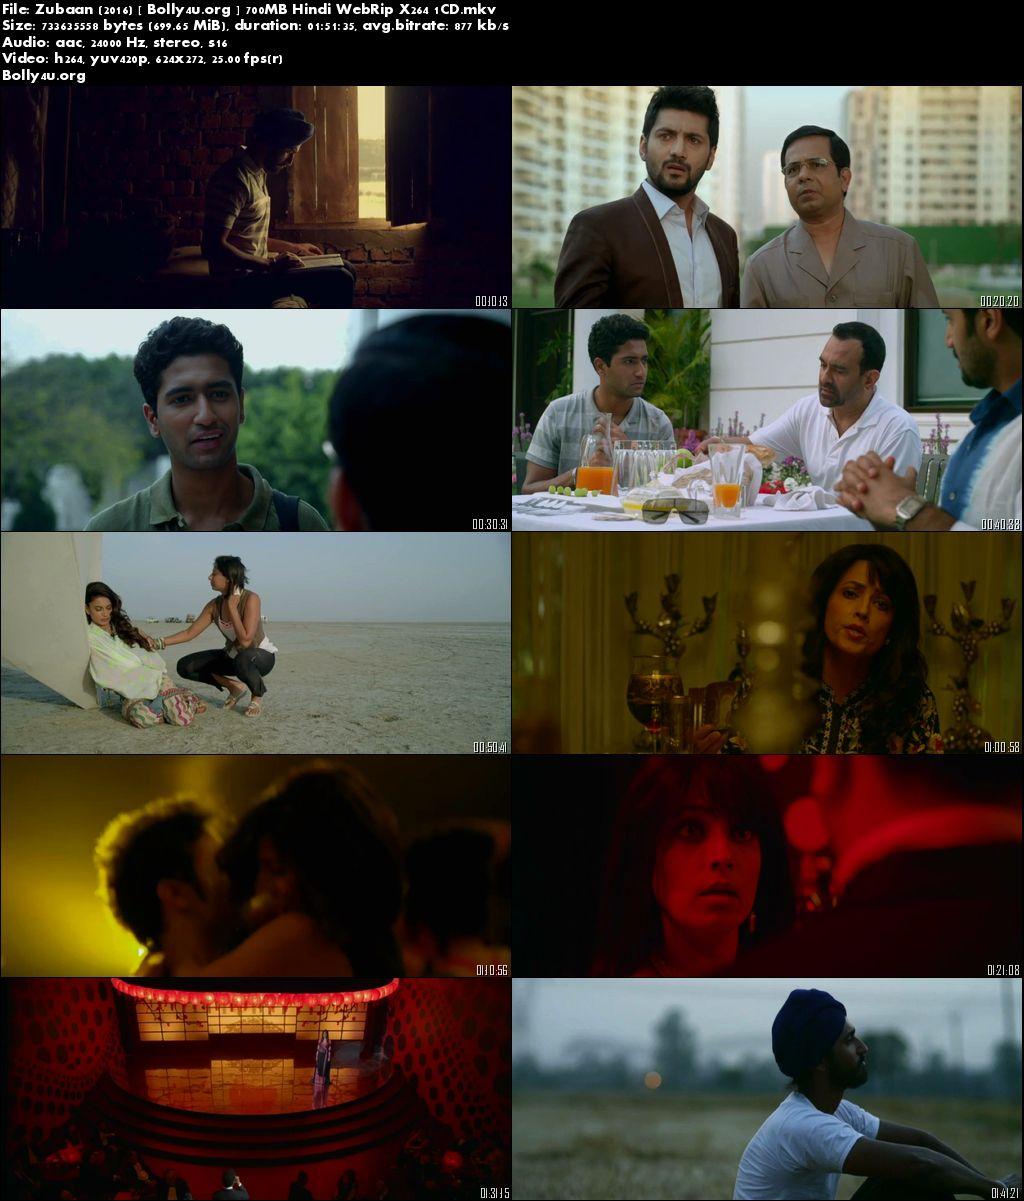 Zubaan 2016 WEBRip 720p Hindi Movie 700MB x264 Download